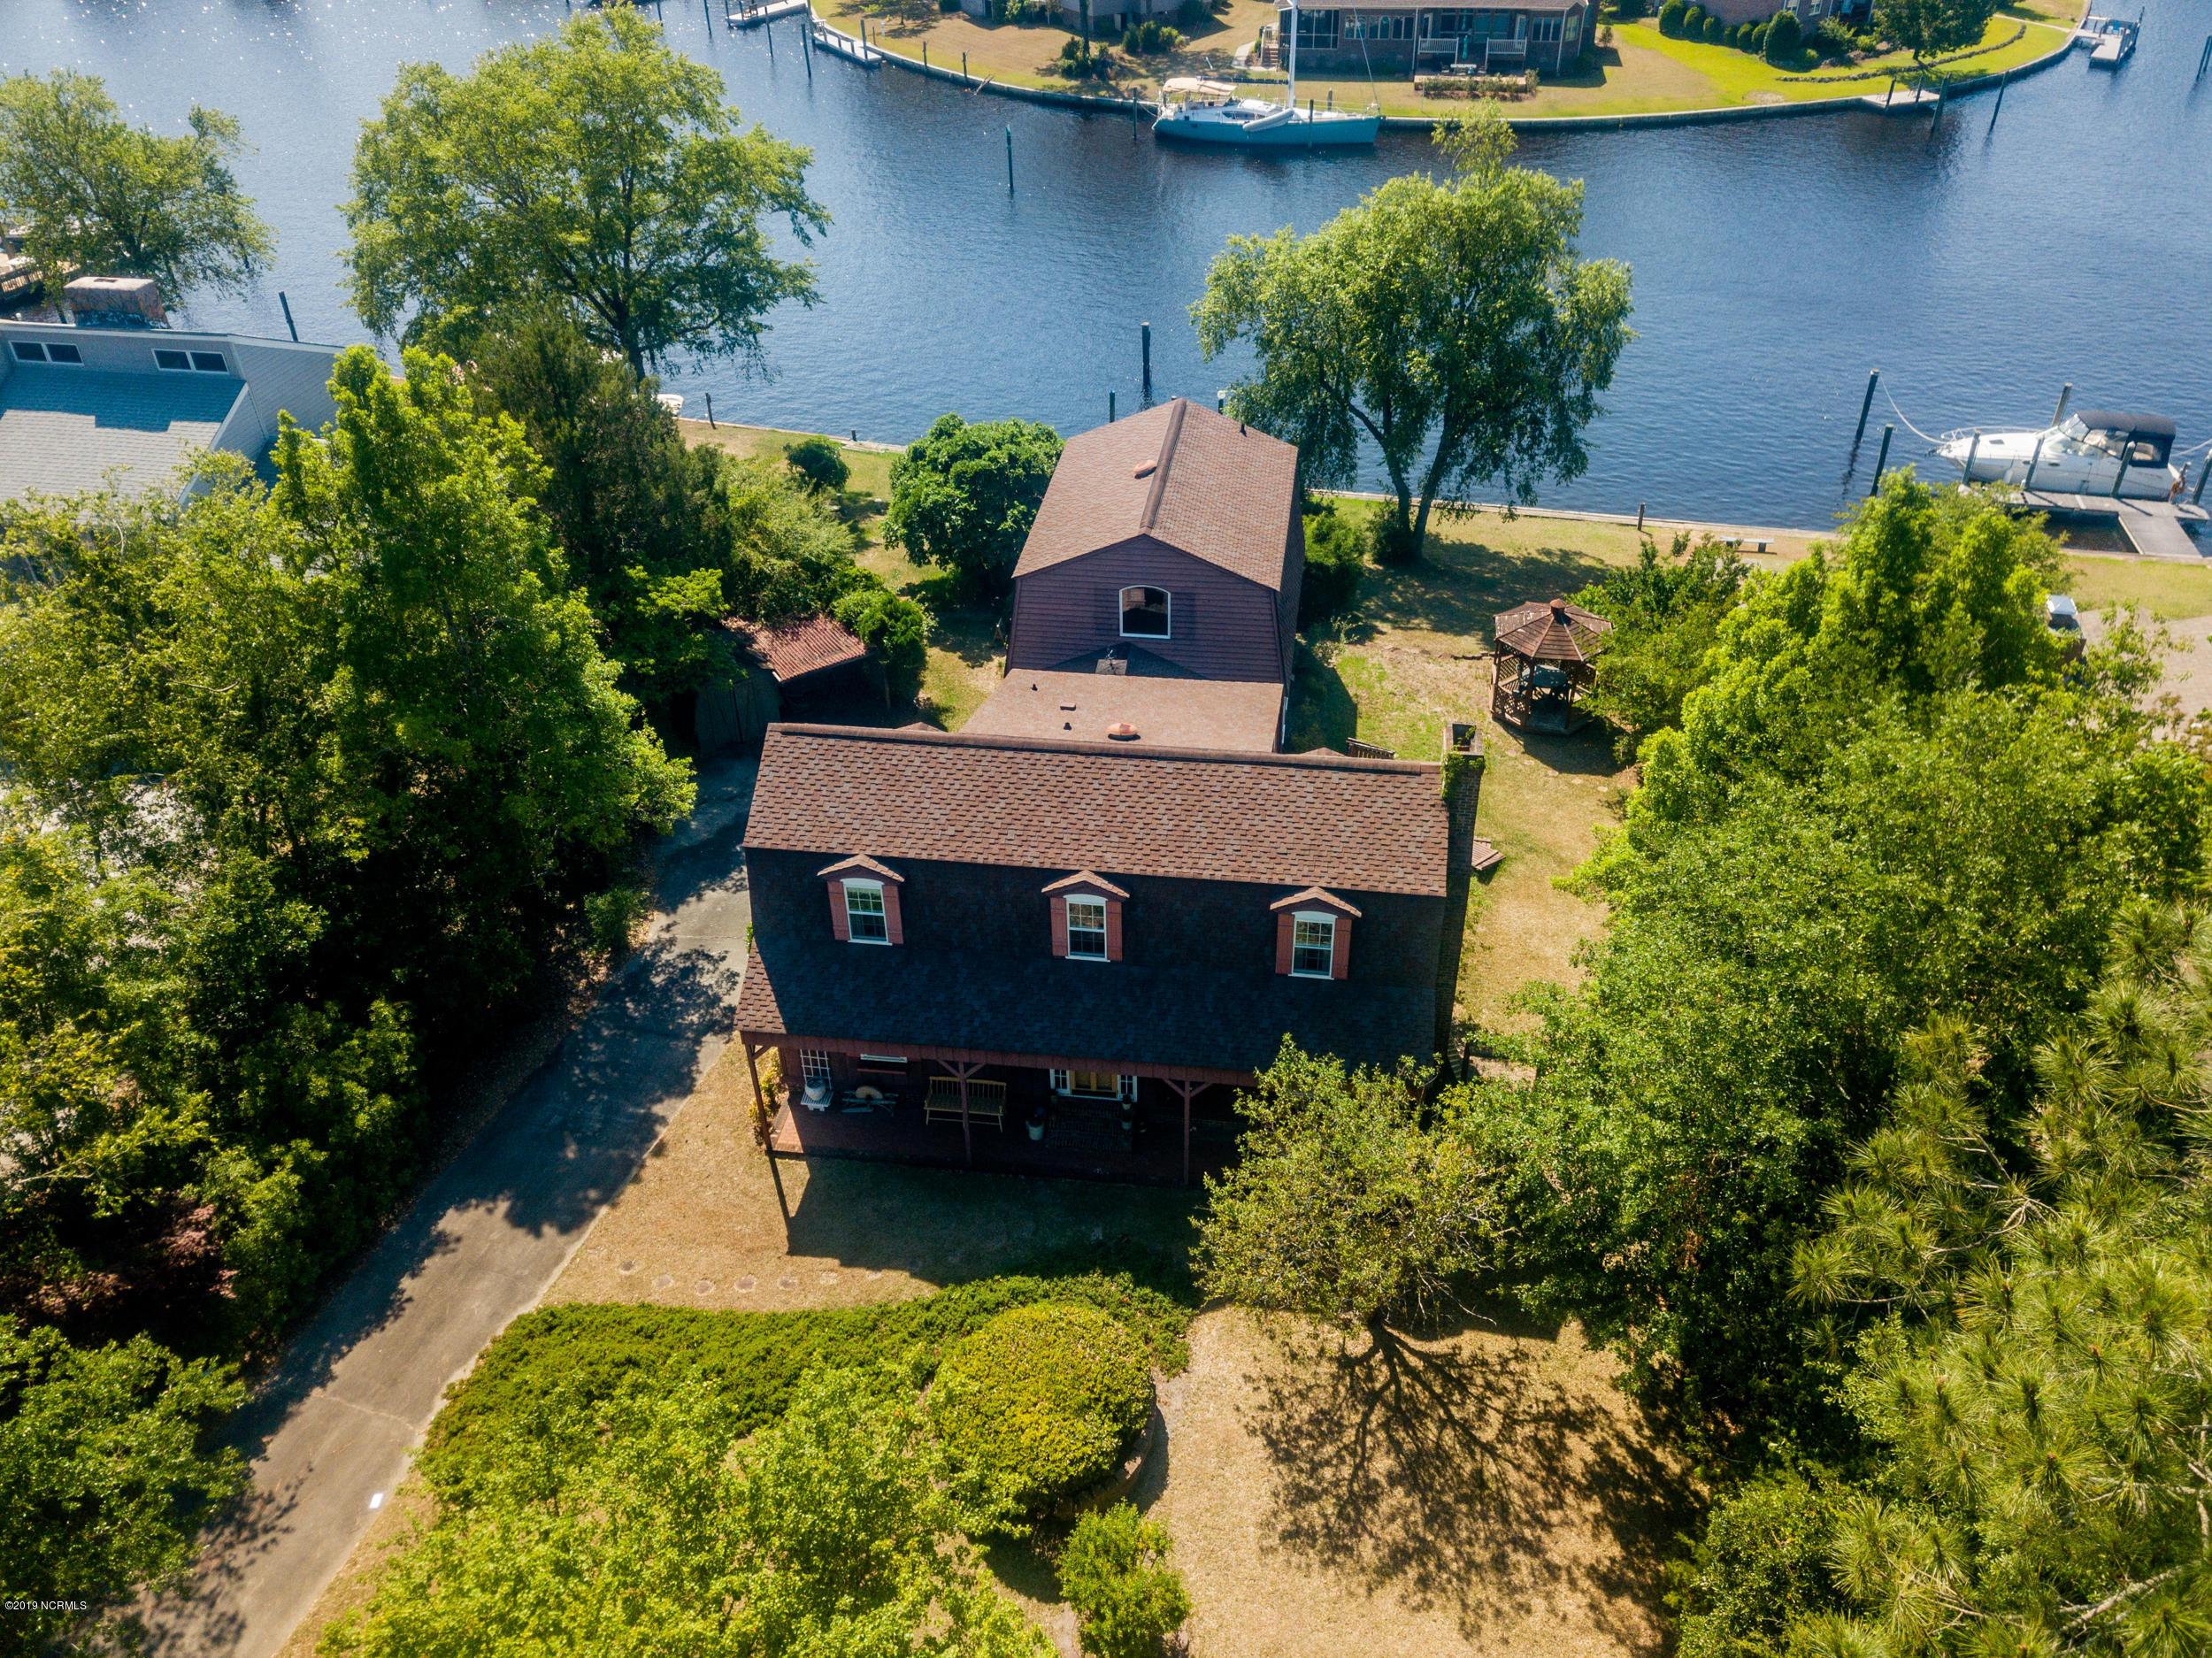 6104 Cardinal Drive, New Bern, North Carolina 28560, 4 Bedrooms Bedrooms, 6 Rooms Rooms,3 BathroomsBathrooms,Single family residence,For sale,Cardinal,100165875